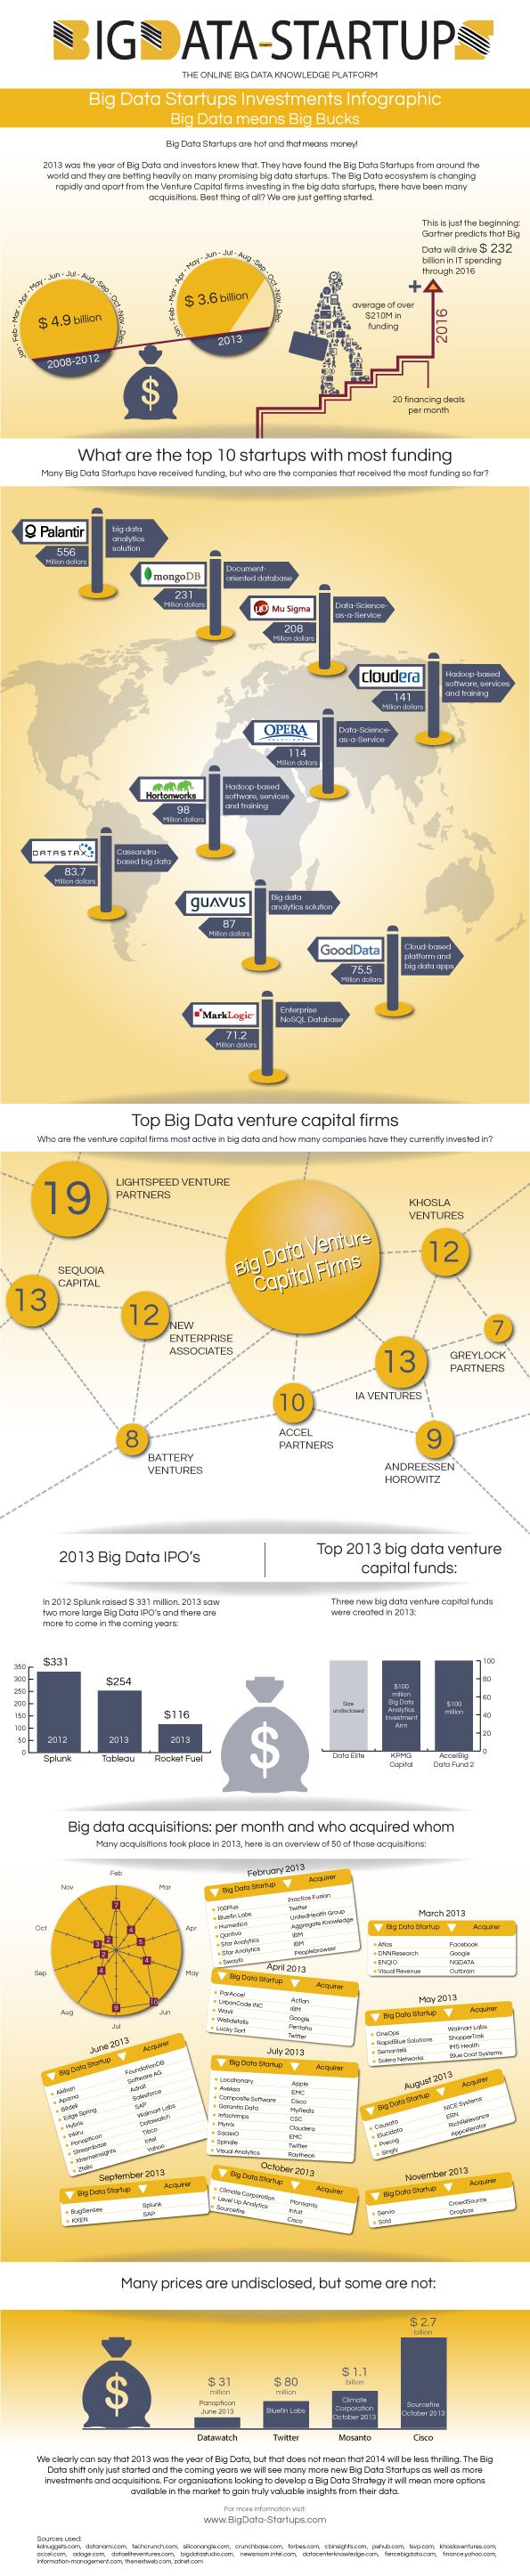 Big Data Investments by Startups #bigdata